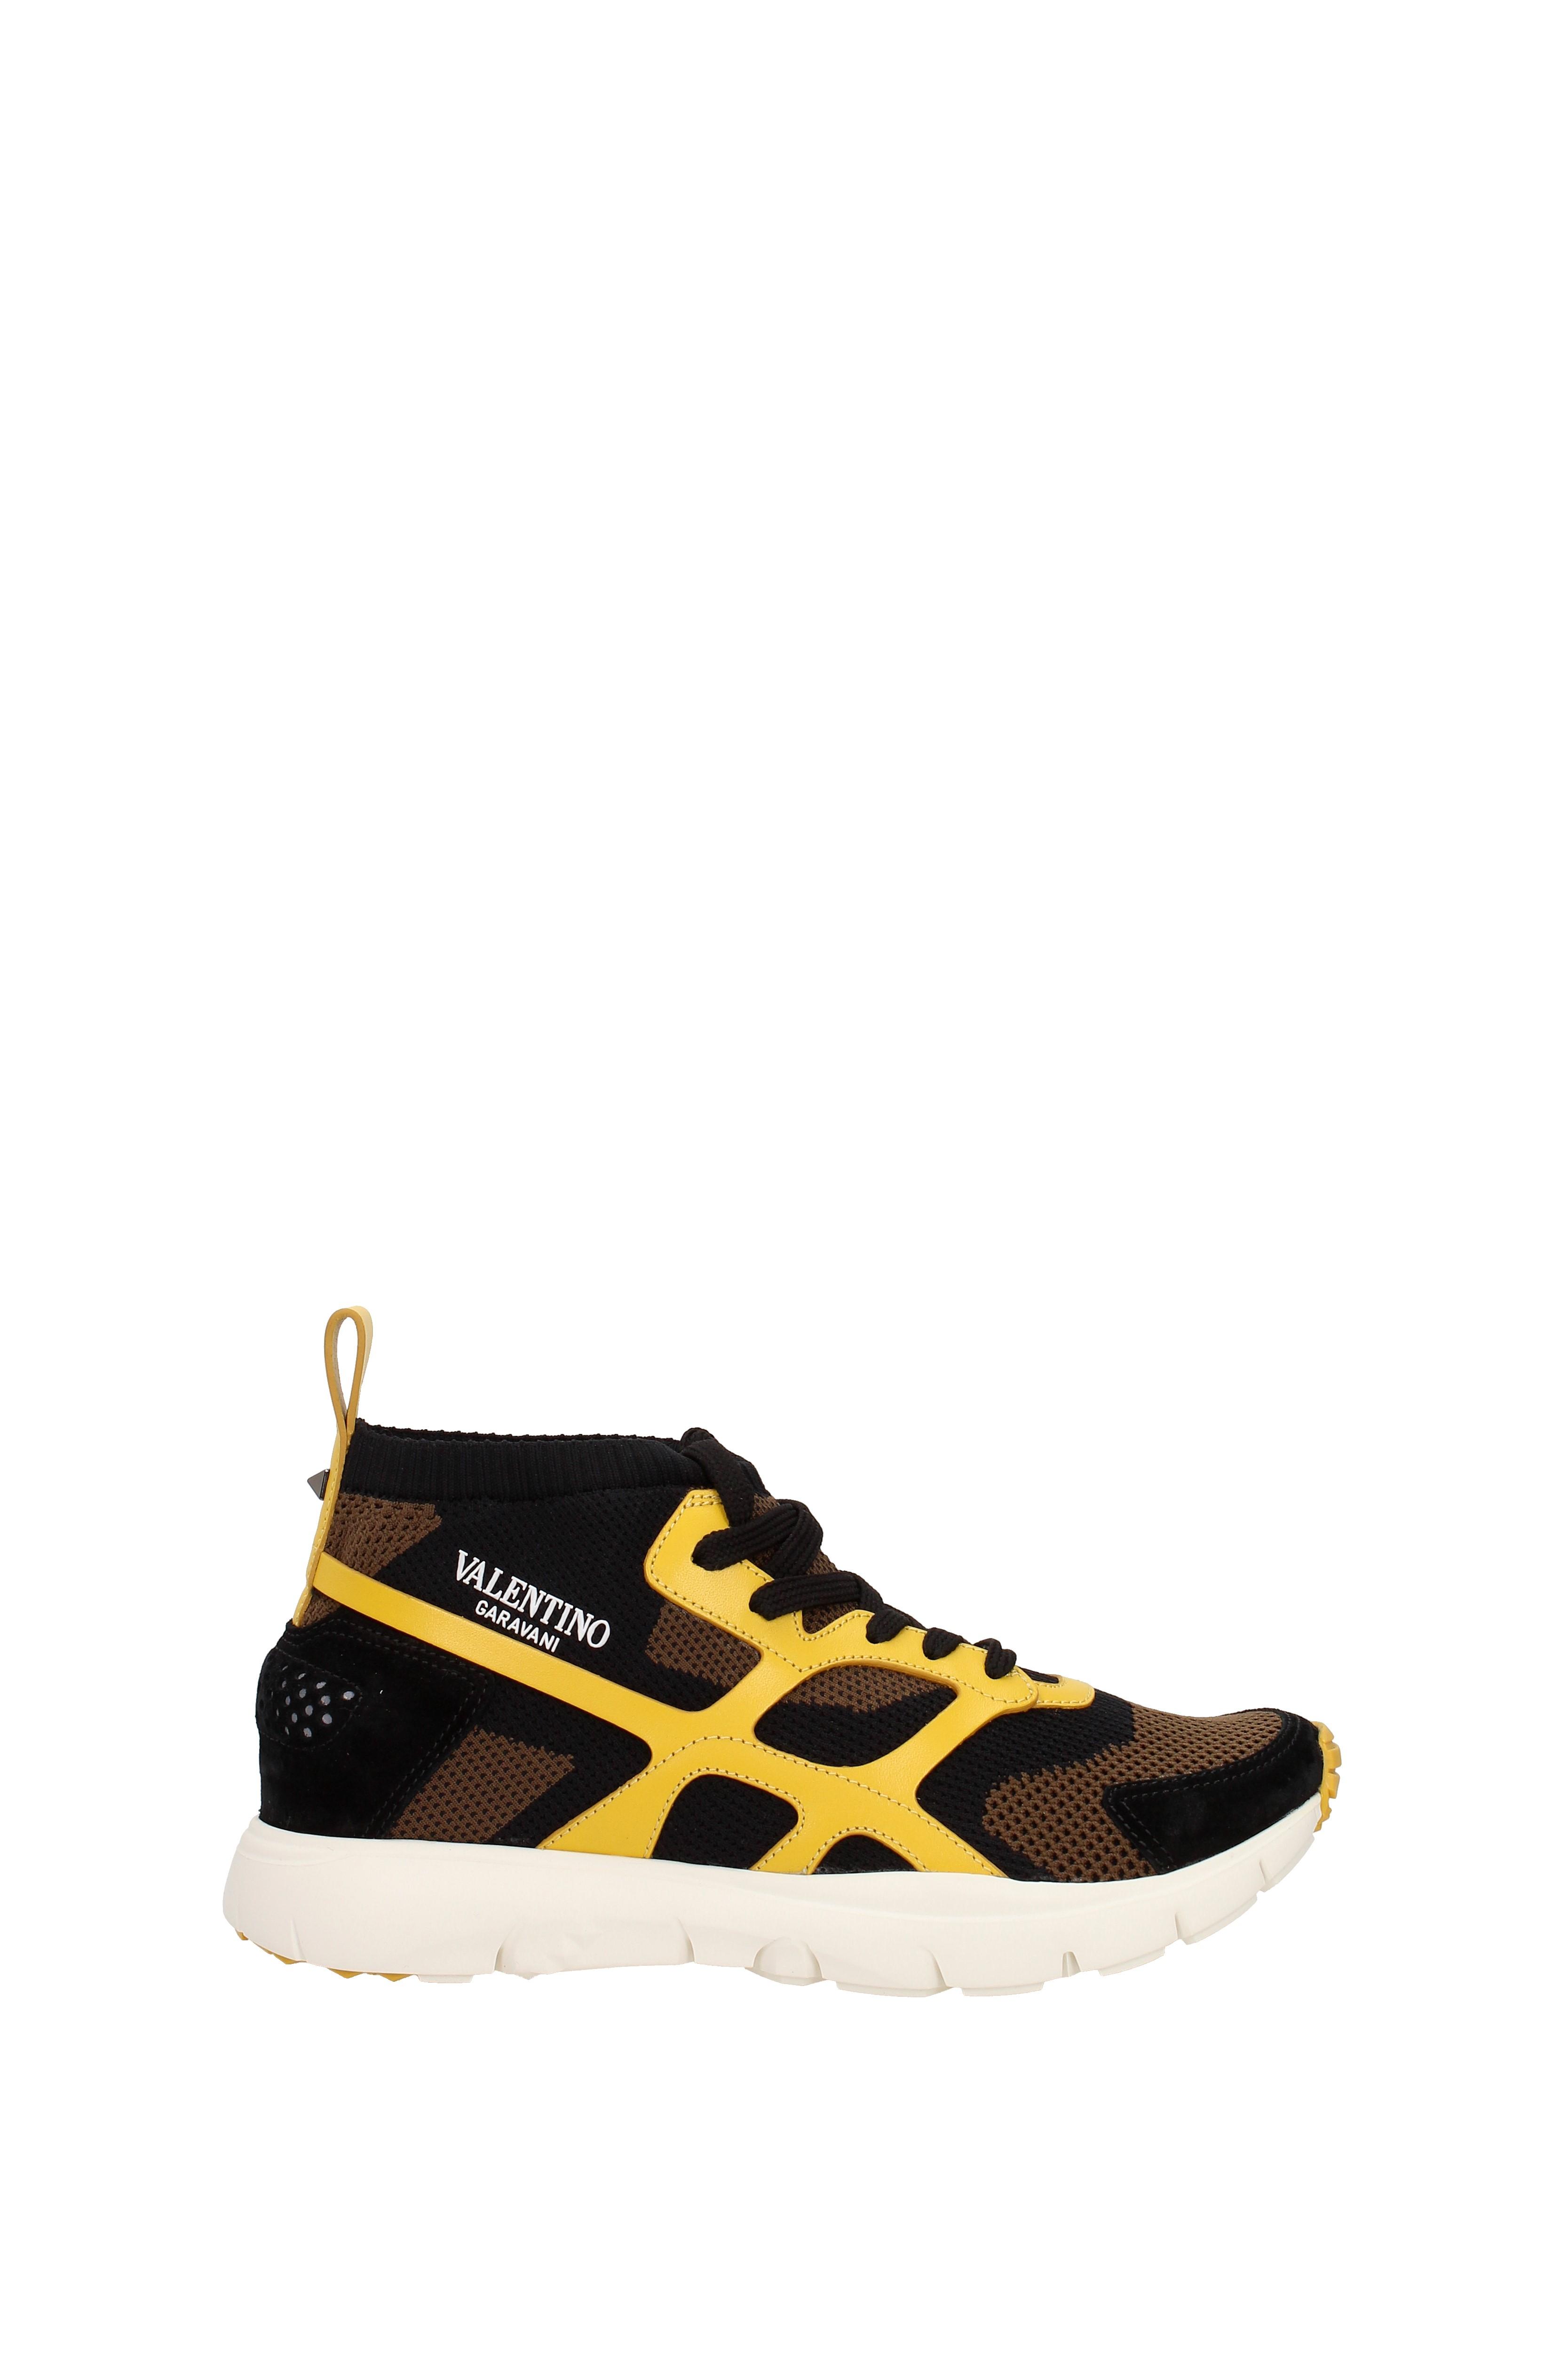 Scarpe da ginnastica Valentino Garavani Garavani Garavani Uomo - Tessuto (2S0A57GHB) 88e167